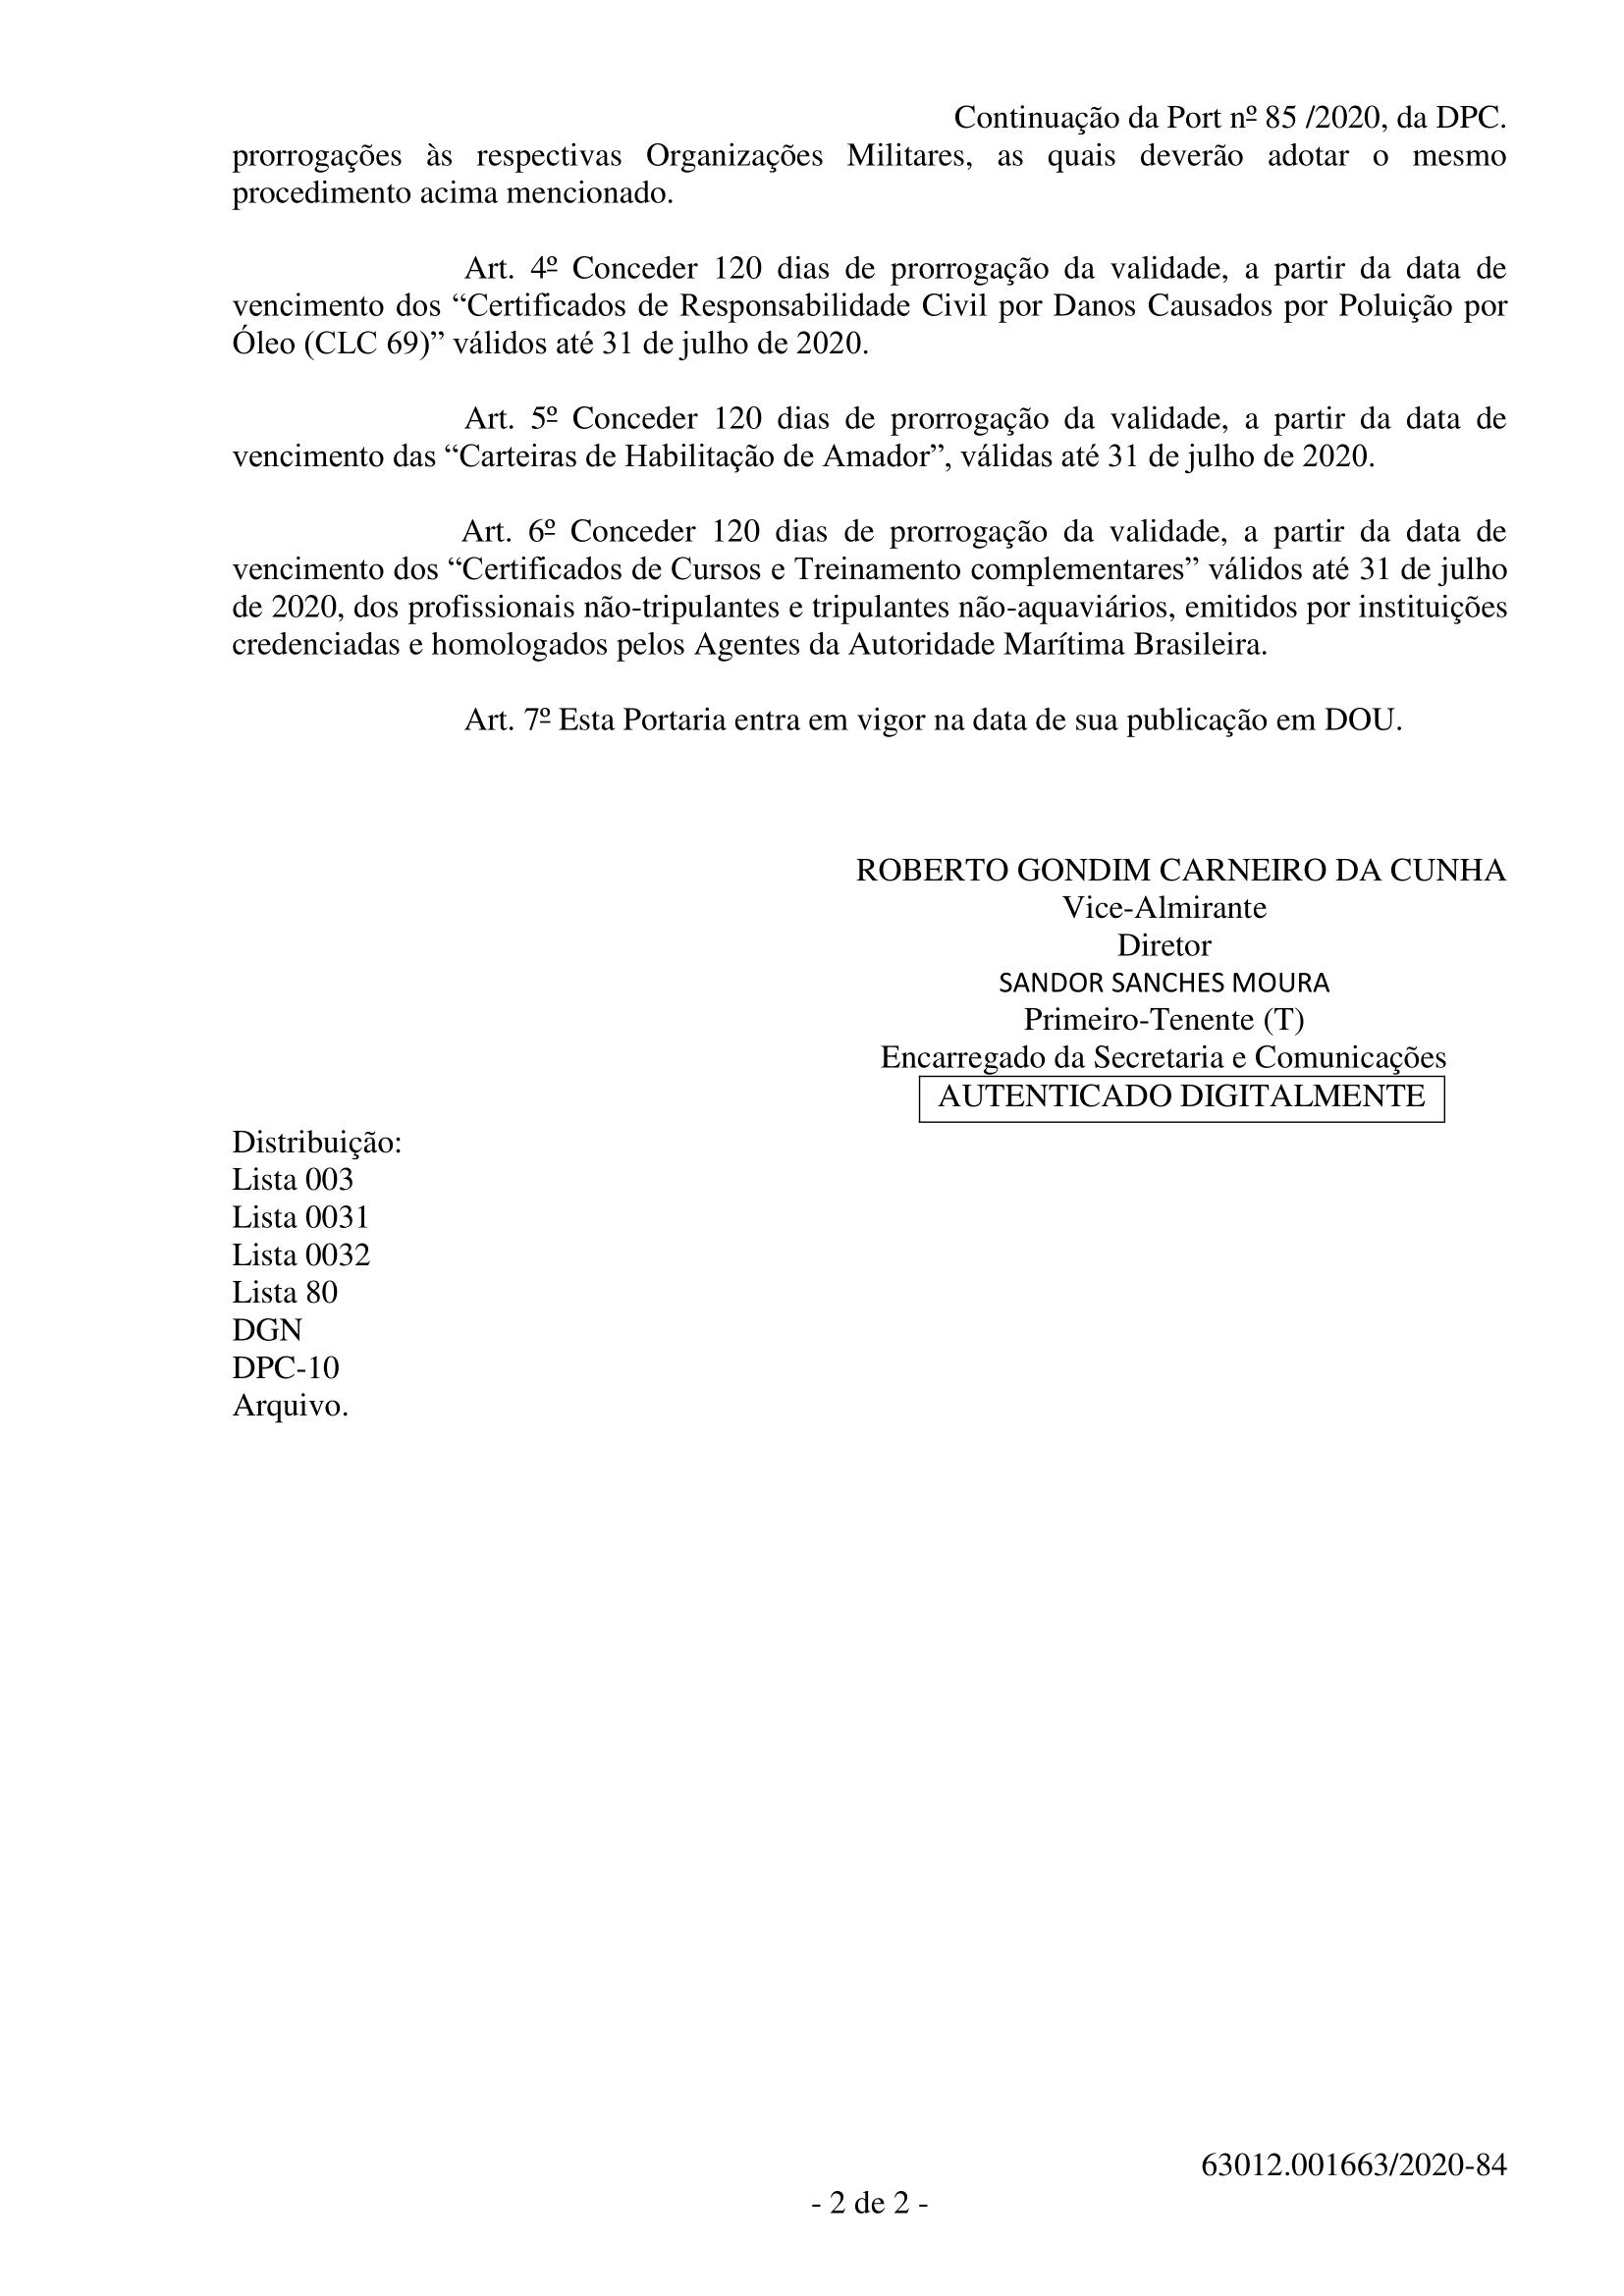 Port-85-2020-DPC-Prorrogacao-1010.1-2